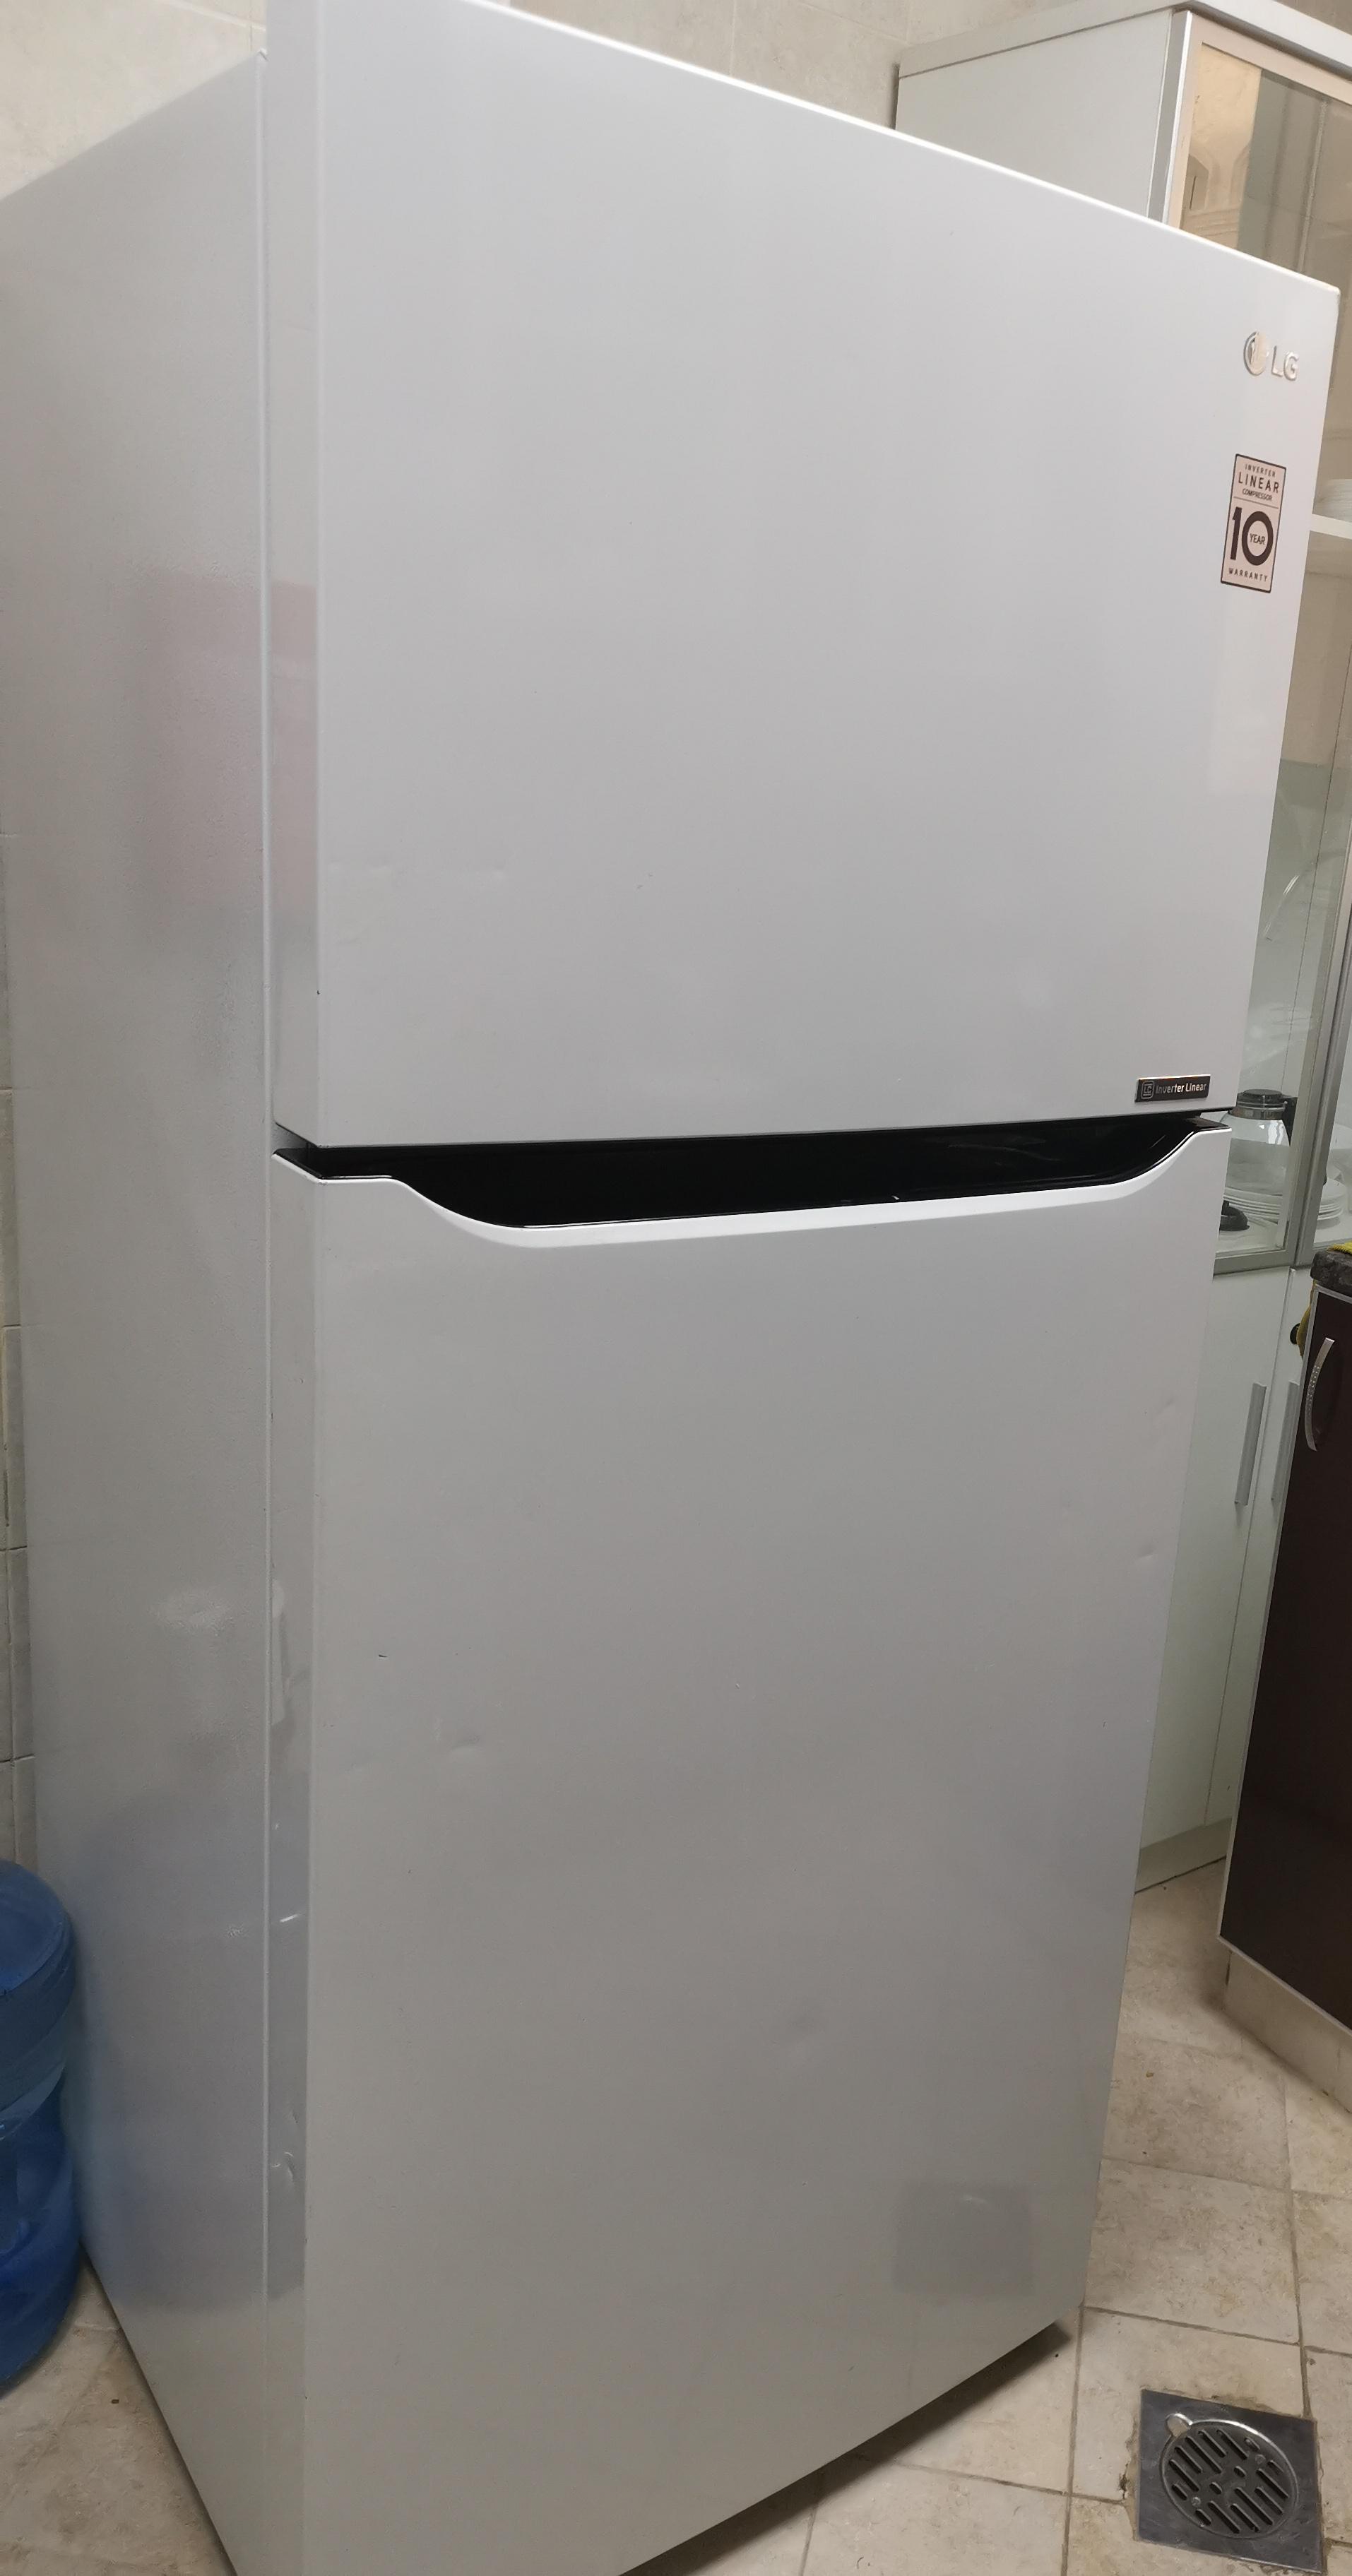 LG inverter linear compressor refrigerator Net Capacity: 438